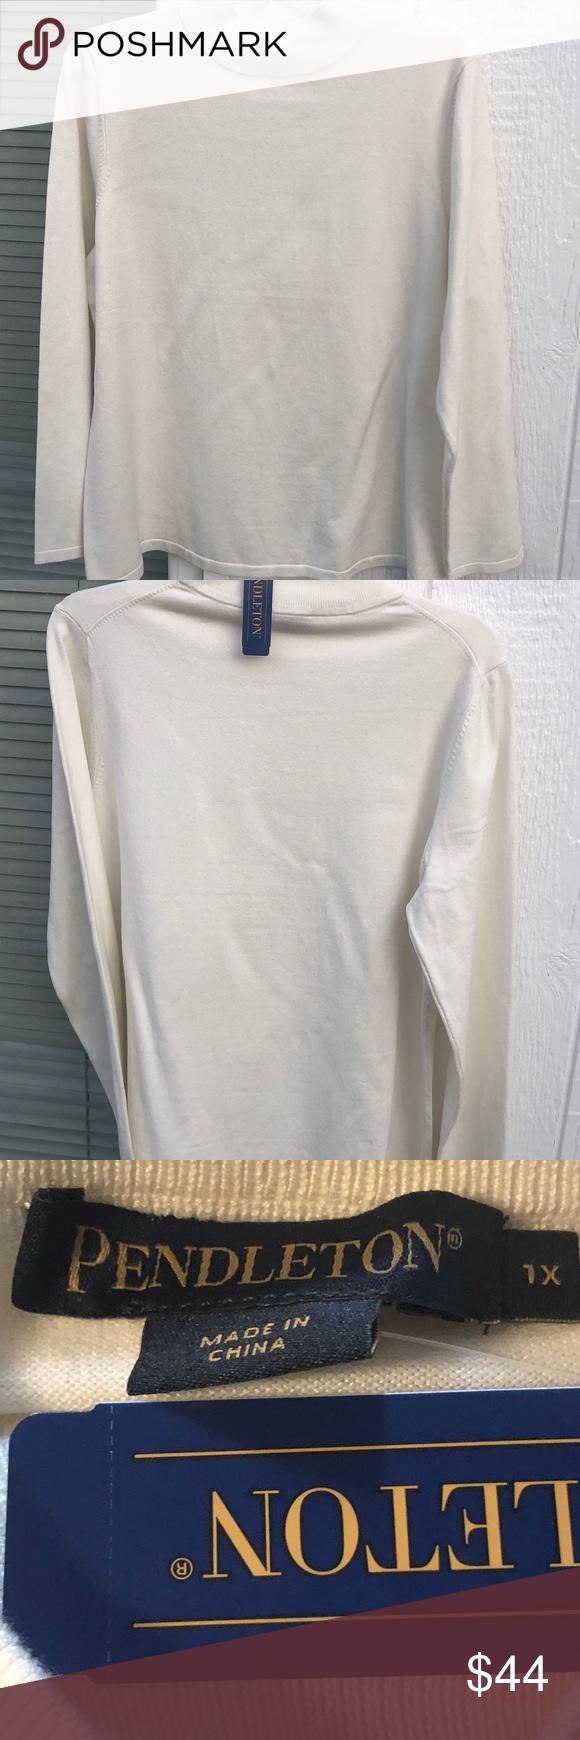 bestille autentisk bedst billigt Pendleton mock neck pullover NWT 1X off white New with tag ...